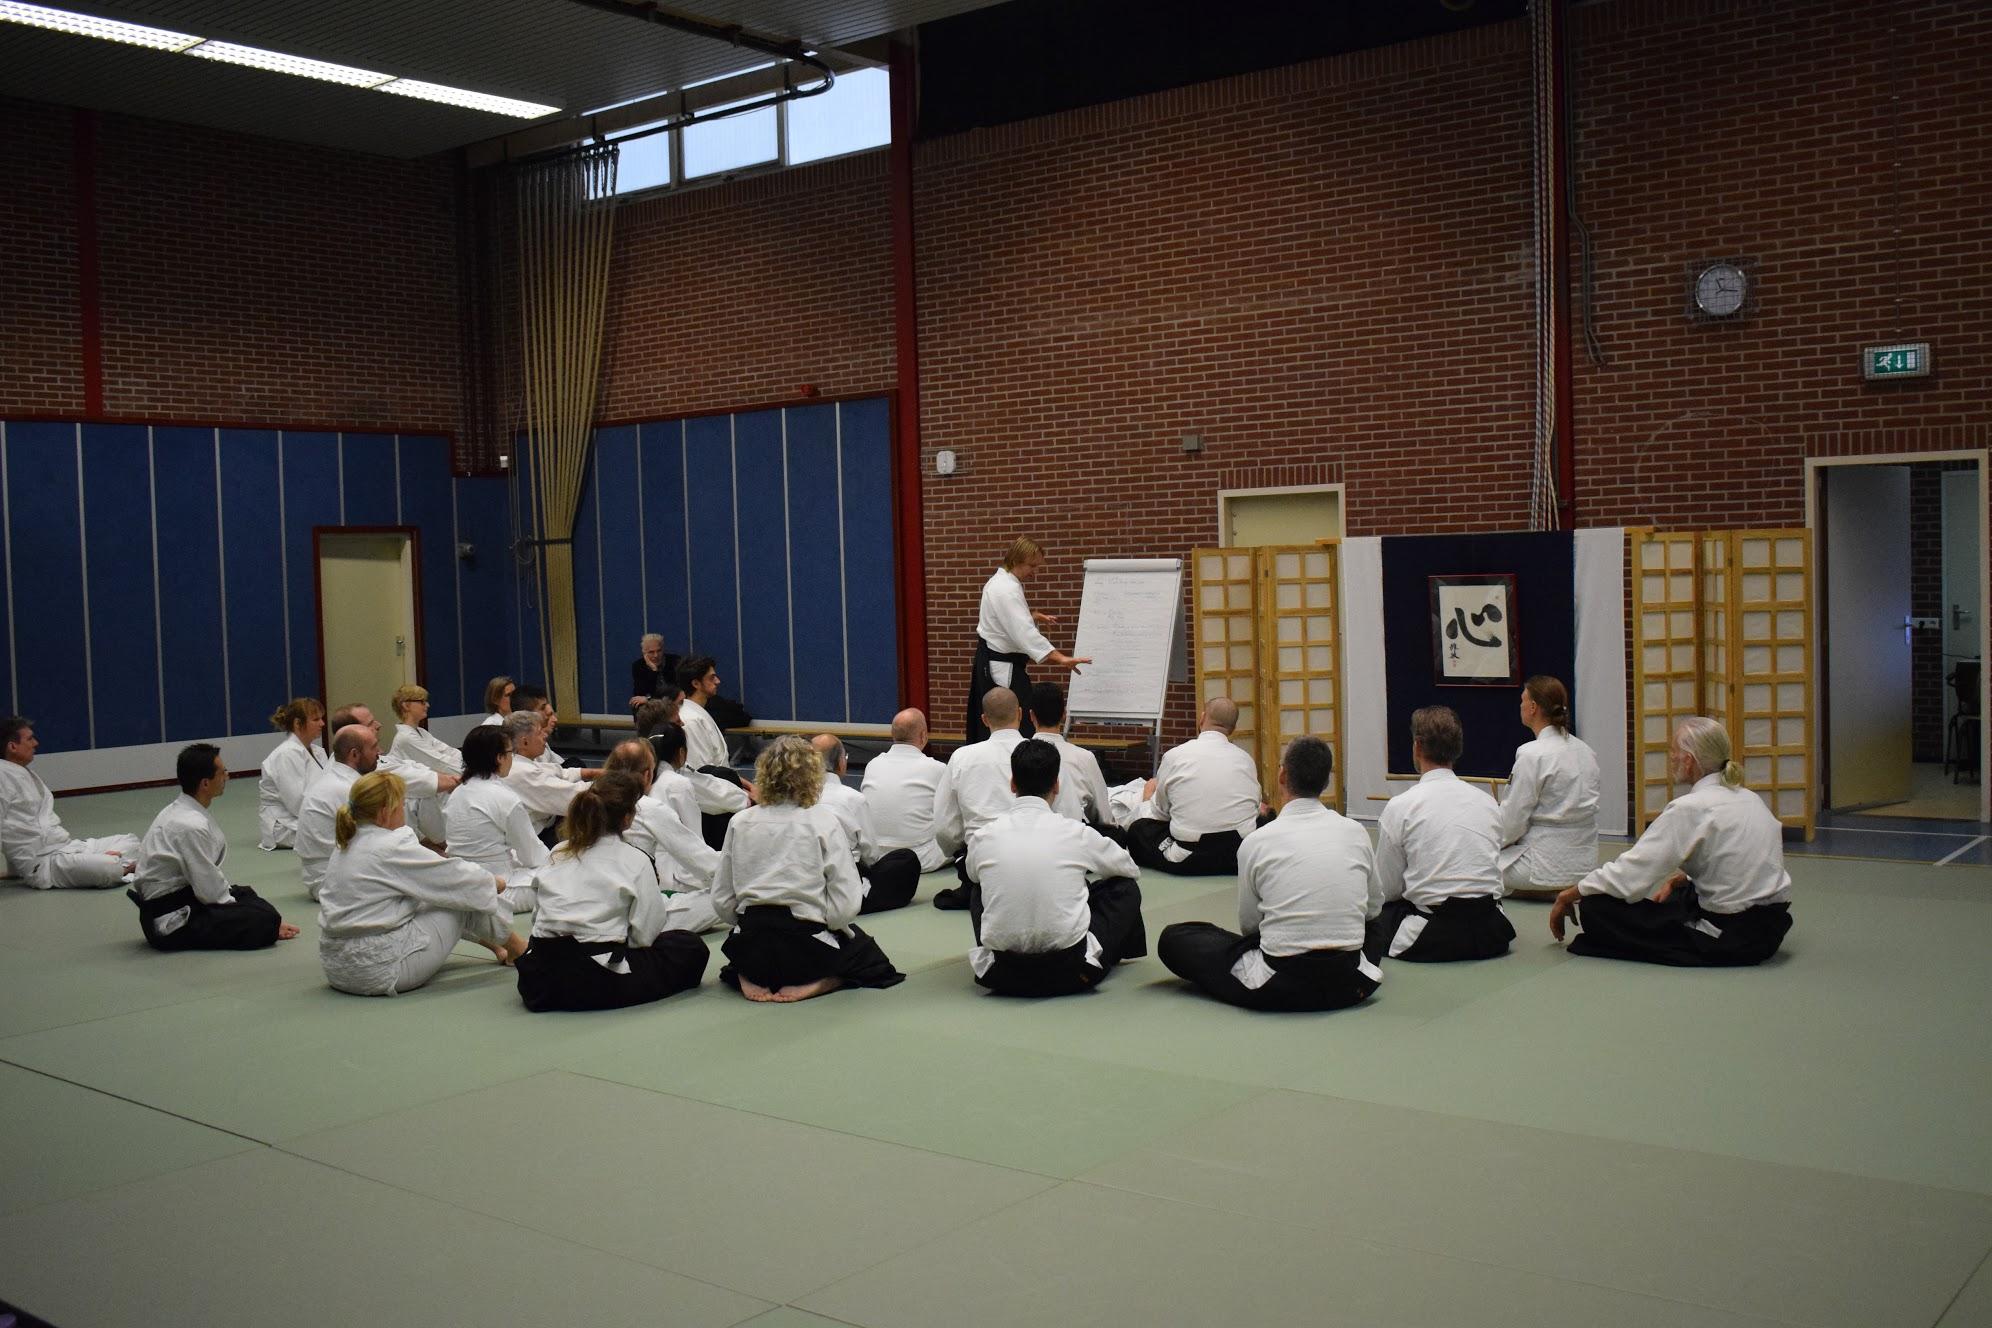 Aikido Yuishinkai Nederland